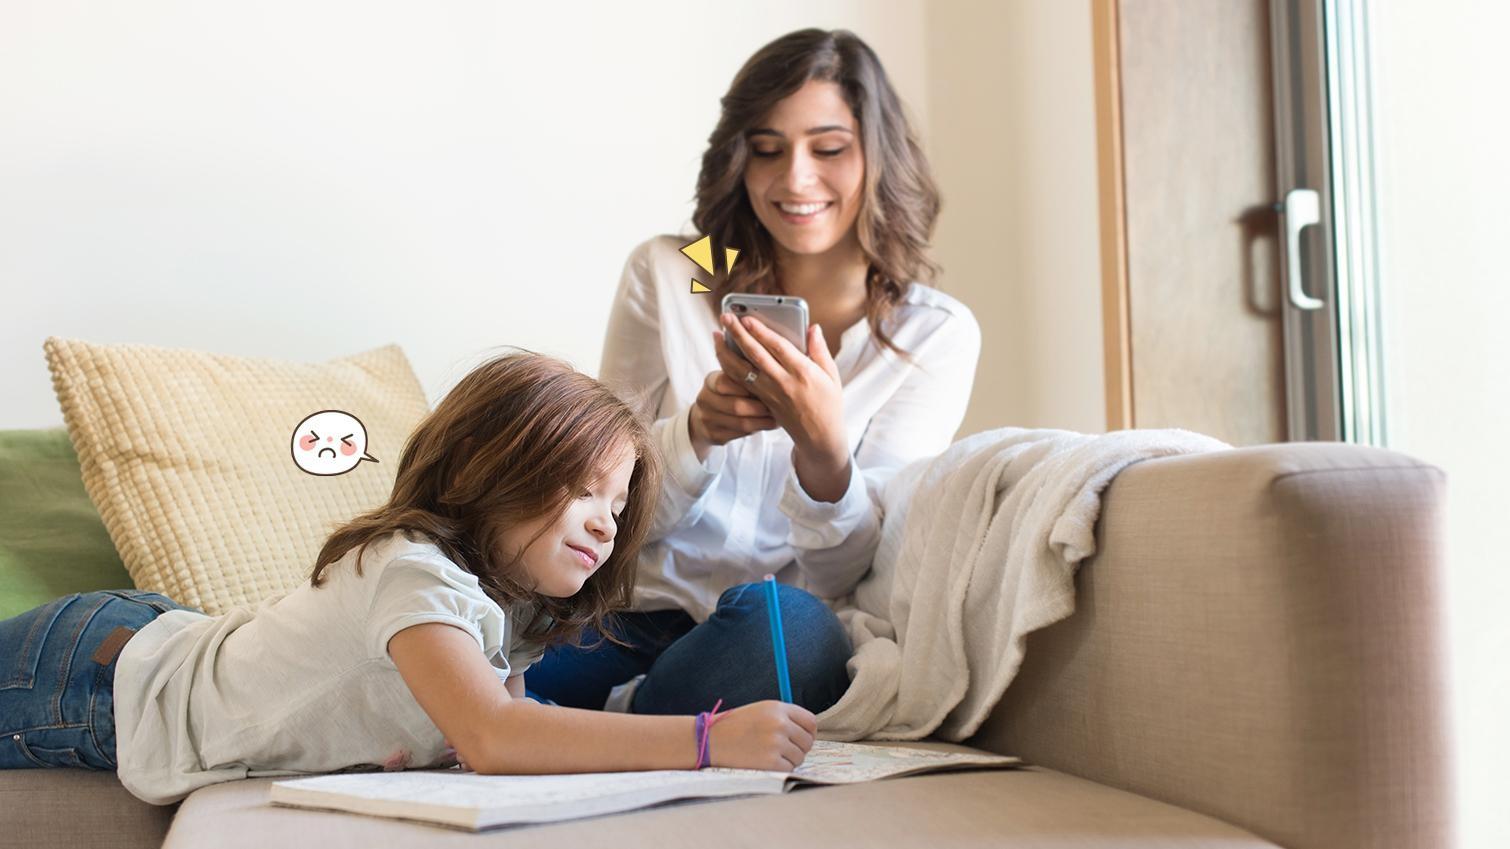 5 Dampak Kurang Perhatian Orang Tua Bagi Perkembangan Anak